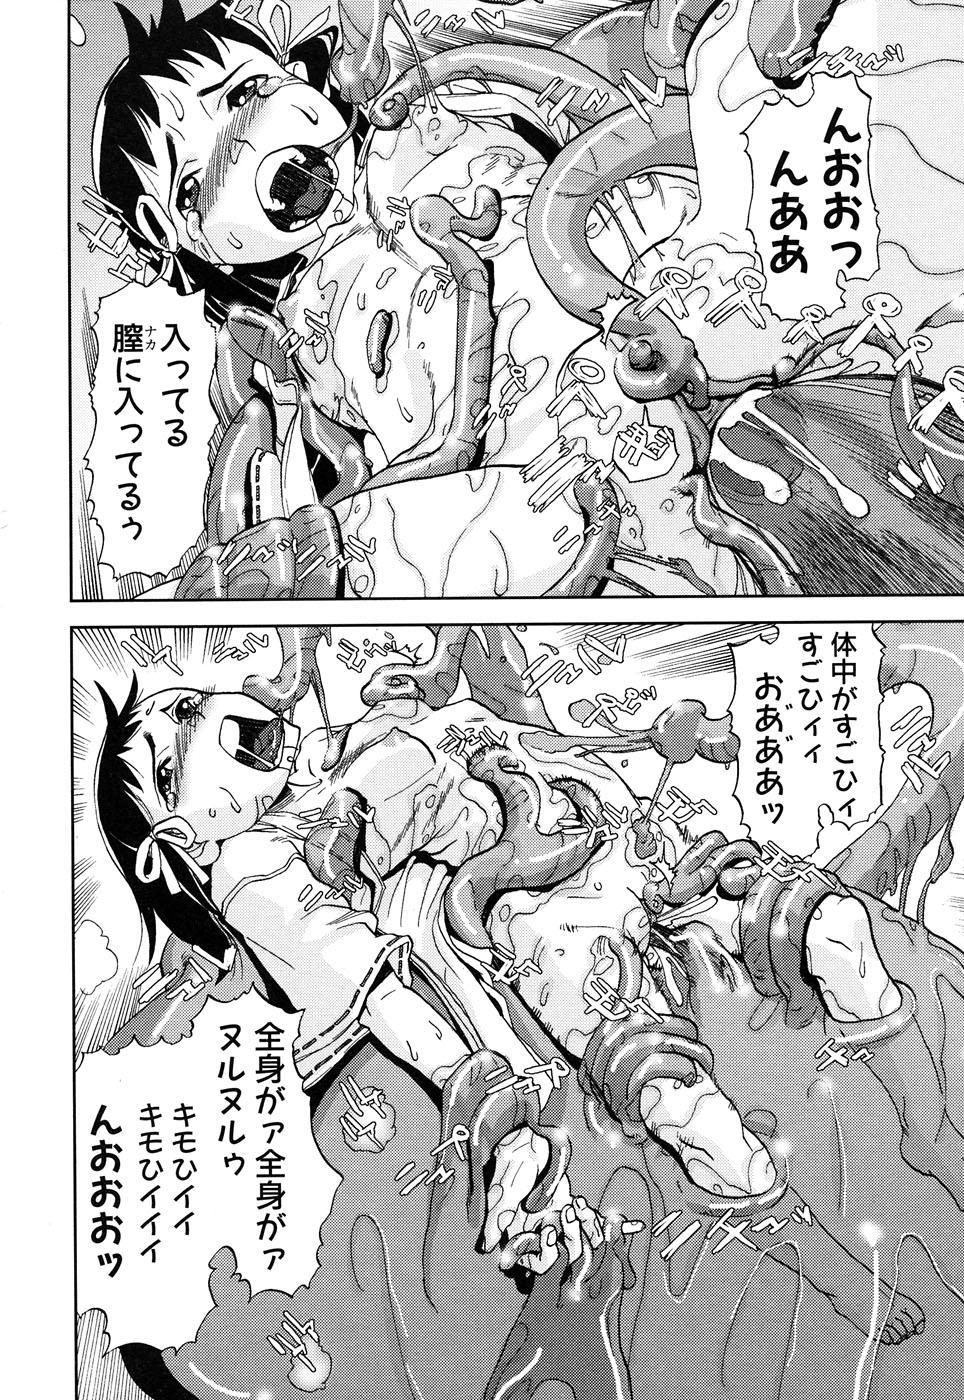 Fechikko VS Series ROUND.2 Miko San VS Maid San 42